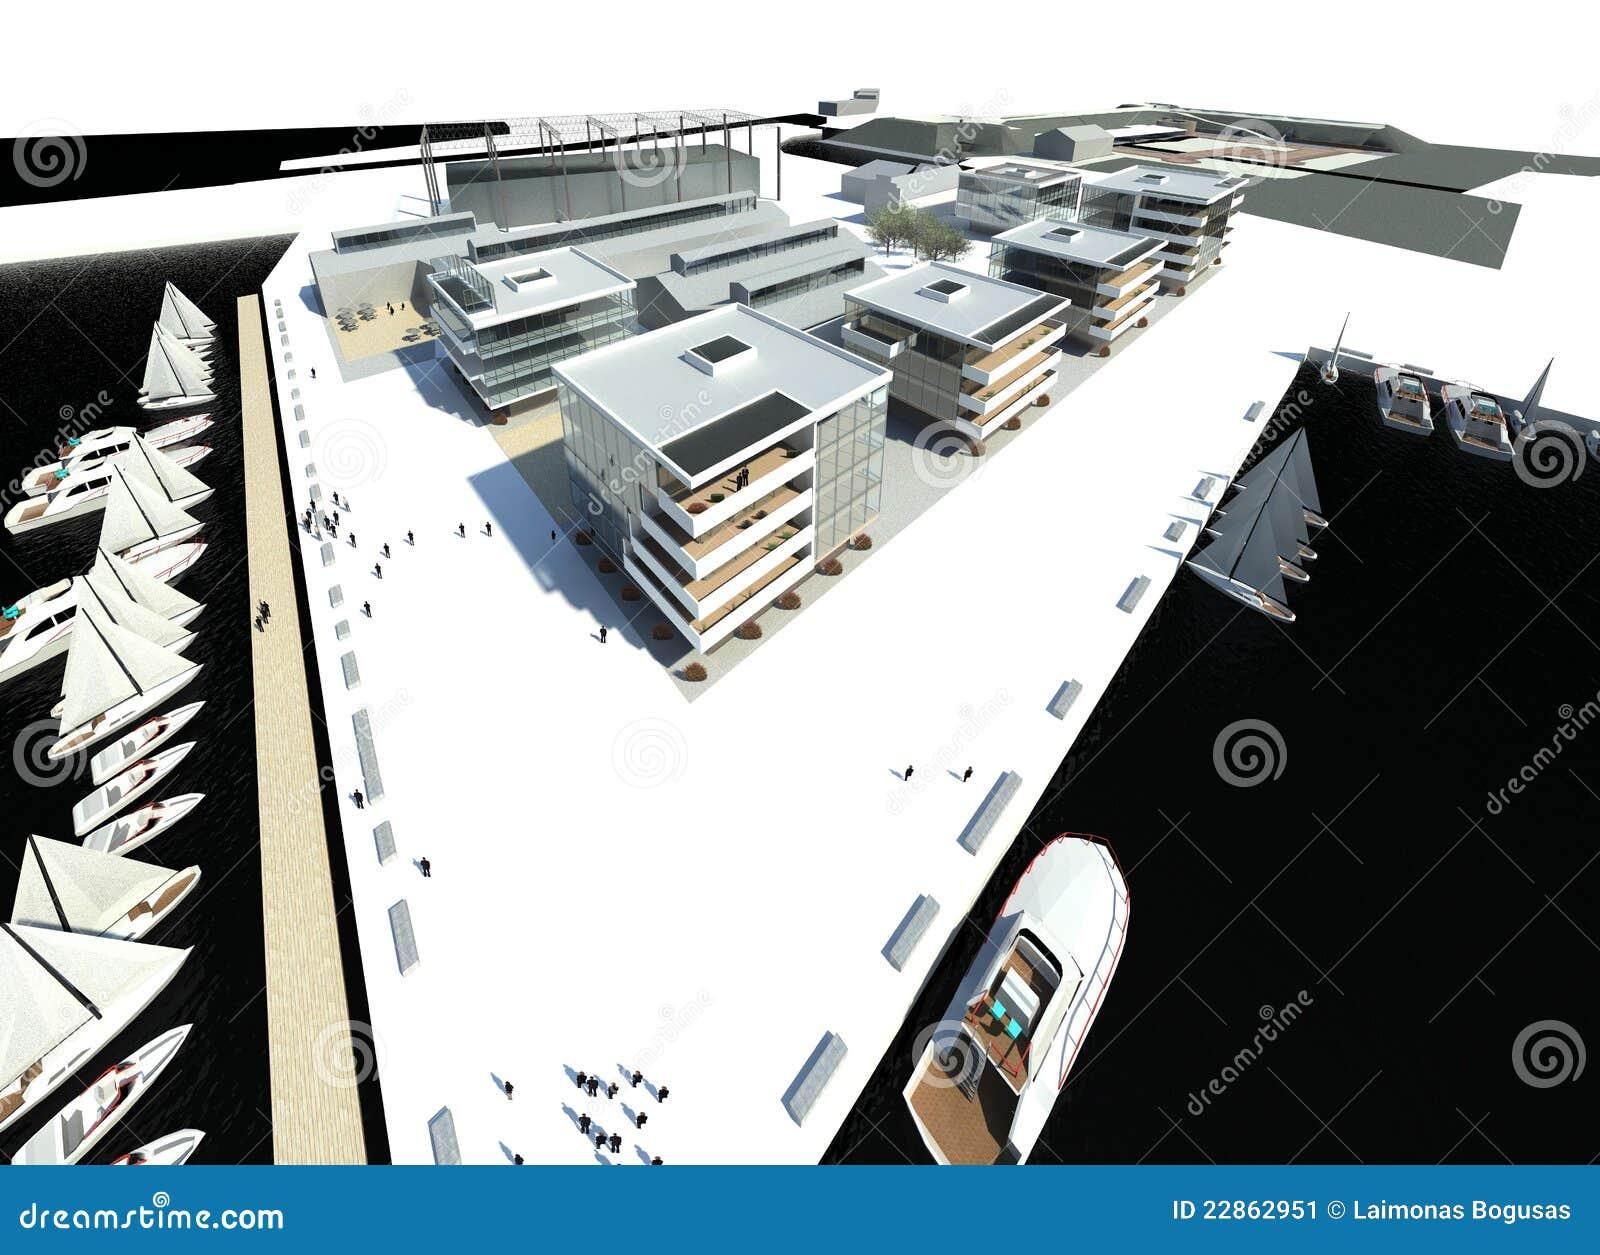 Rappresentazione costruzioni moderne argine immagine for Costruzioni case moderne